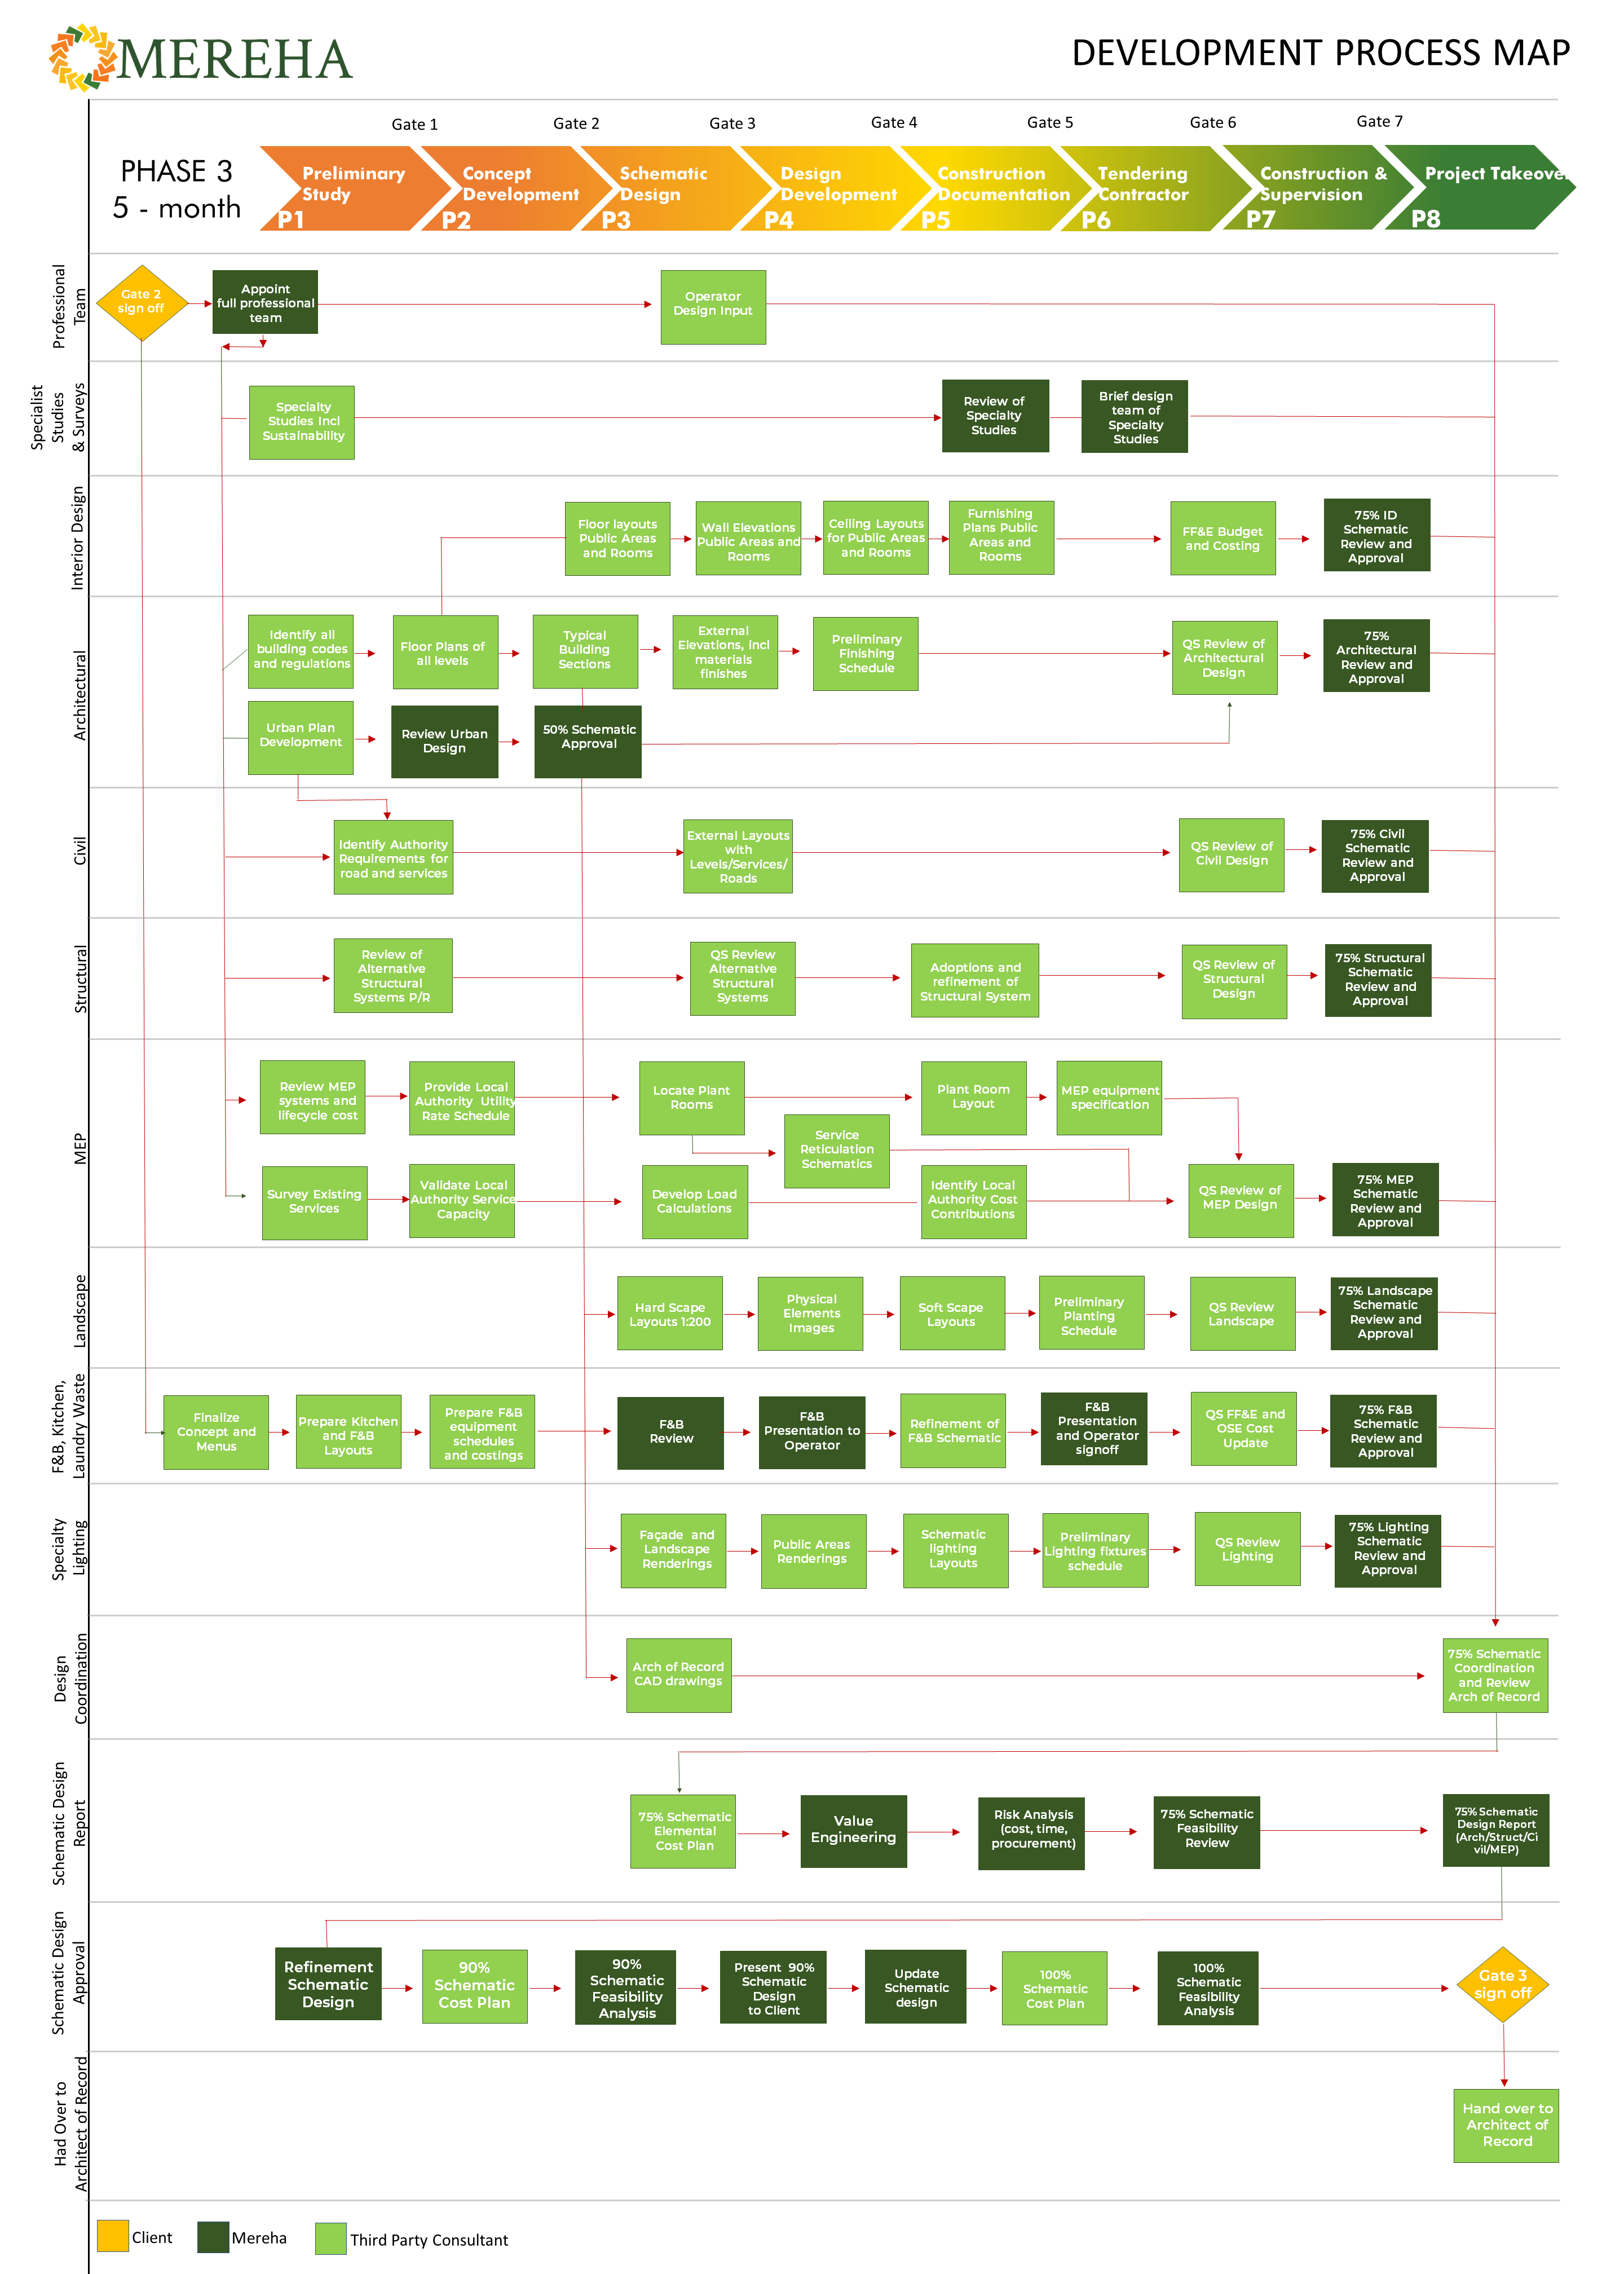 Development process flow